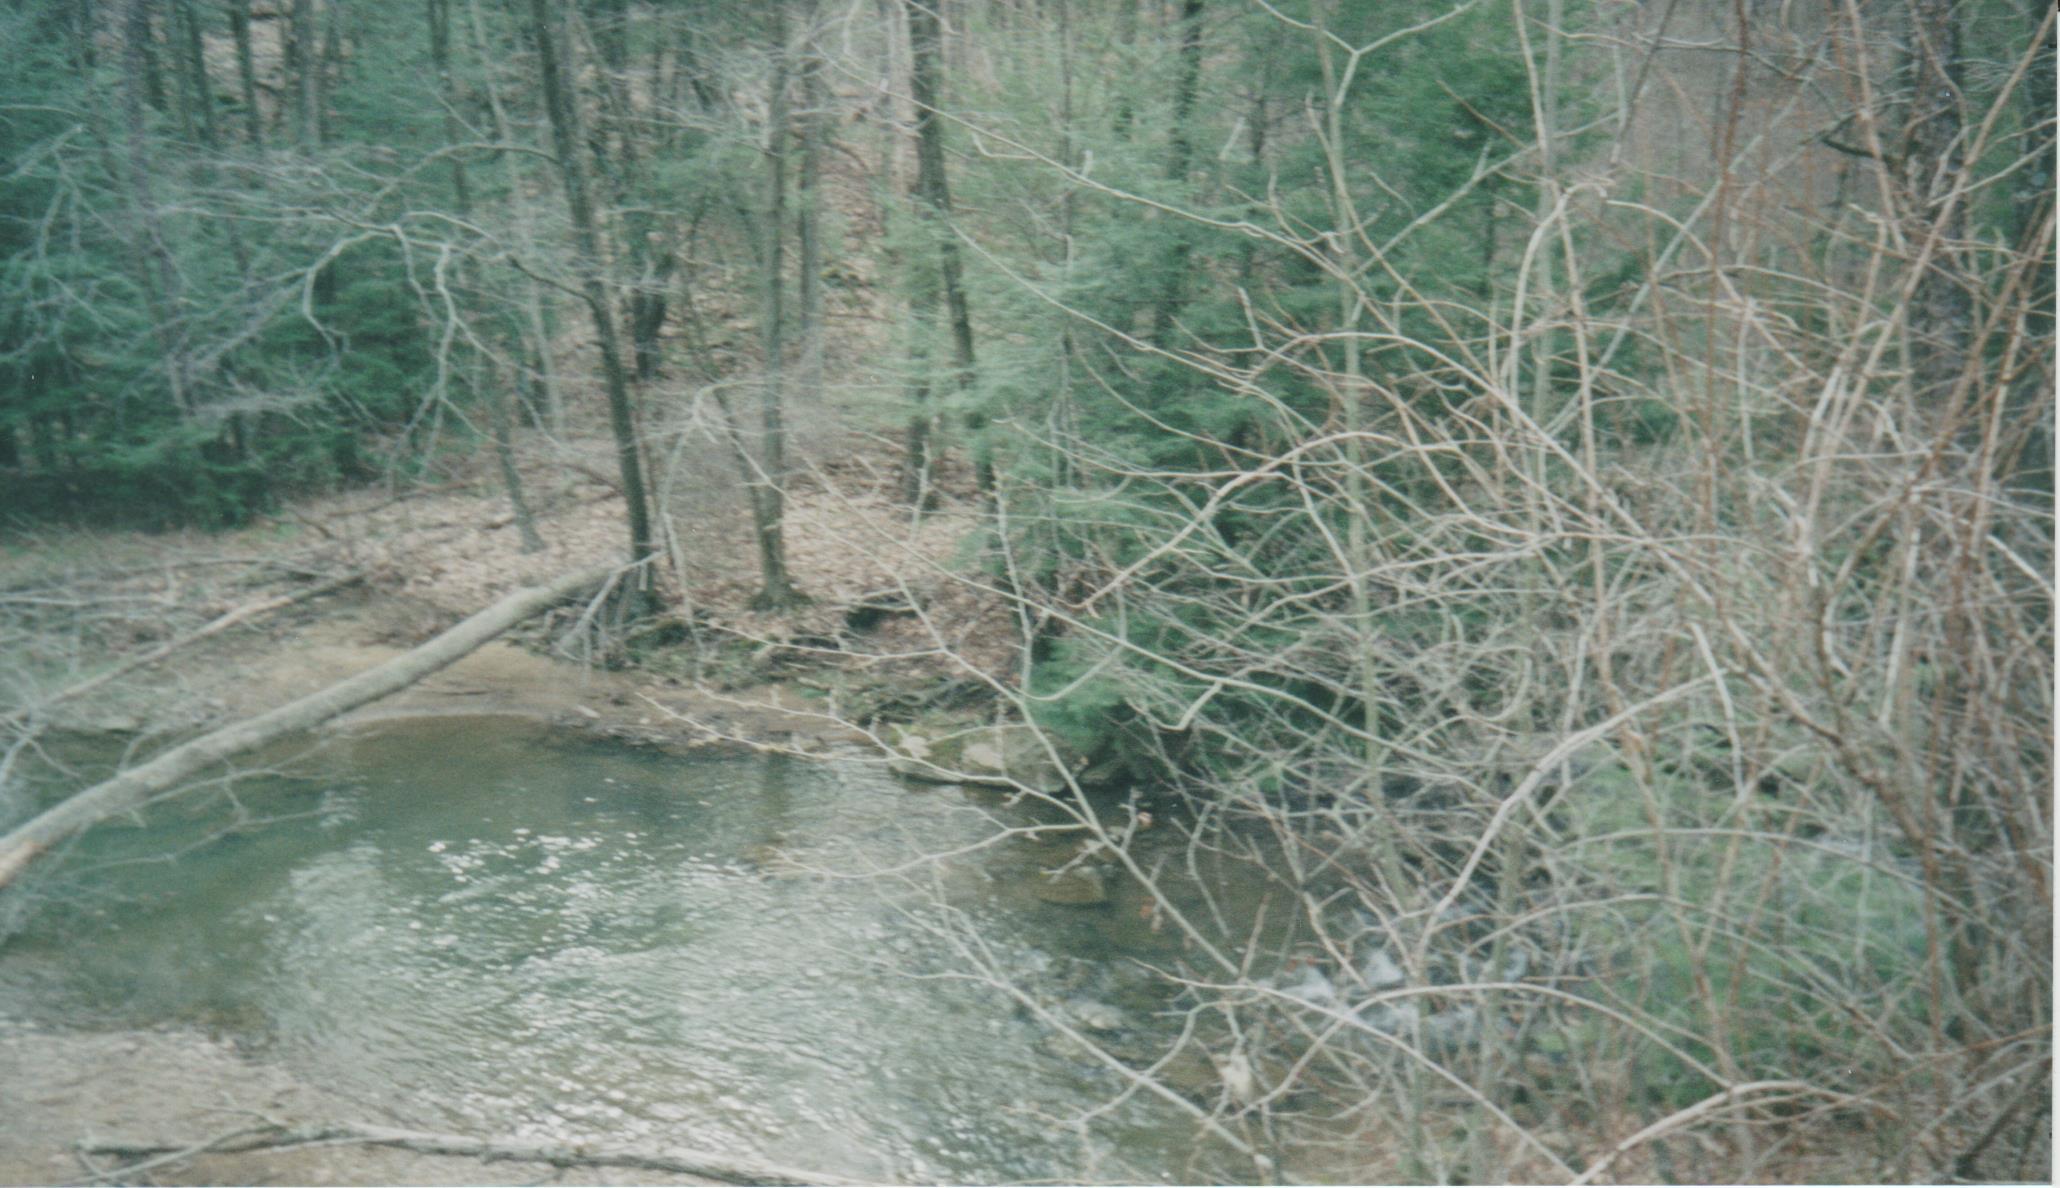 Creek at bridge (where we feed the fish)